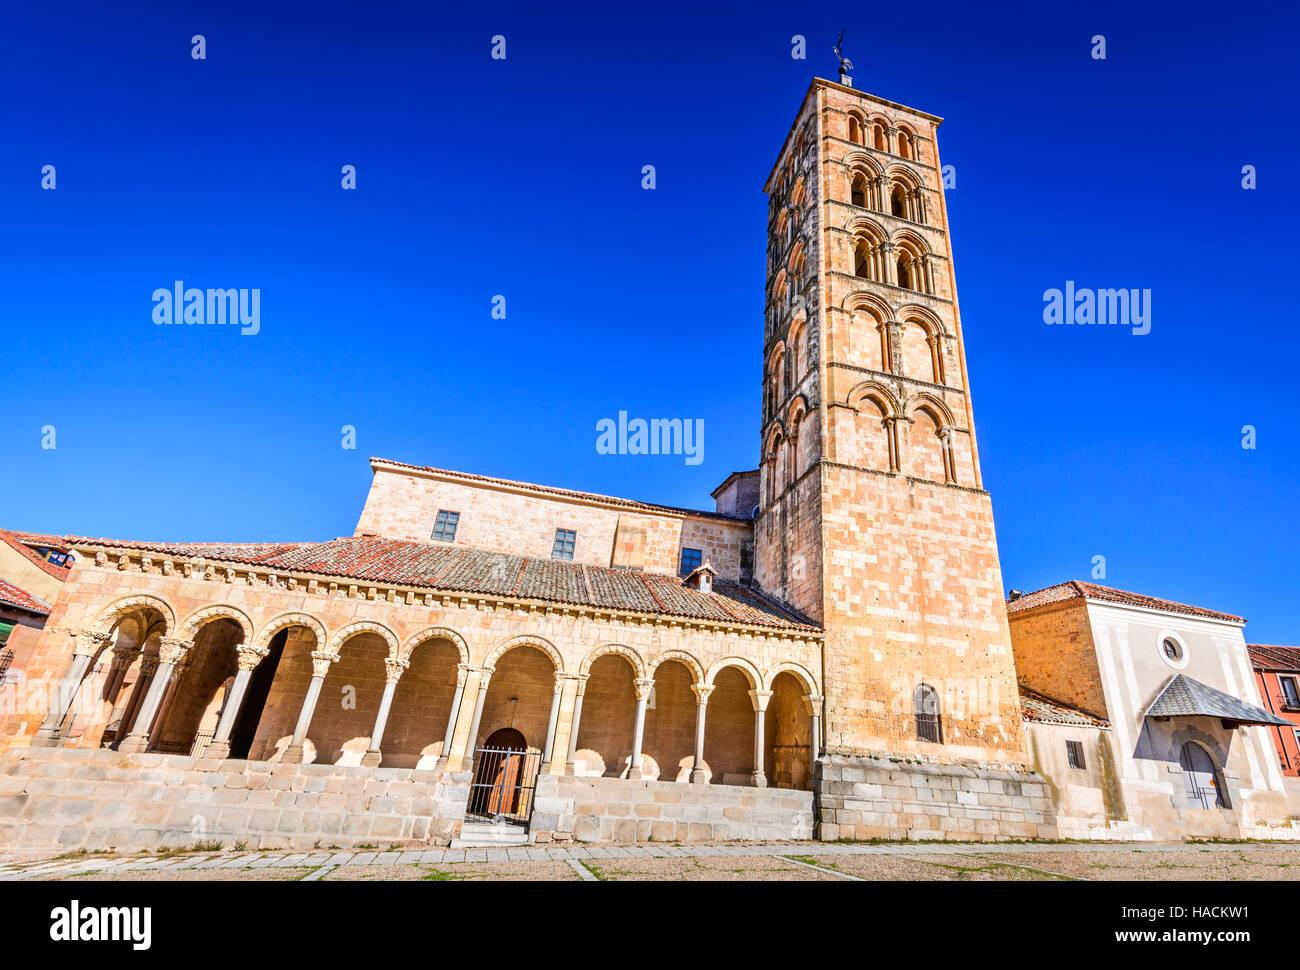 Segovia, Spain. Plaza San Esteban and the church, Castilla y Leon, Spanish medieval cathedral. - Stock Image